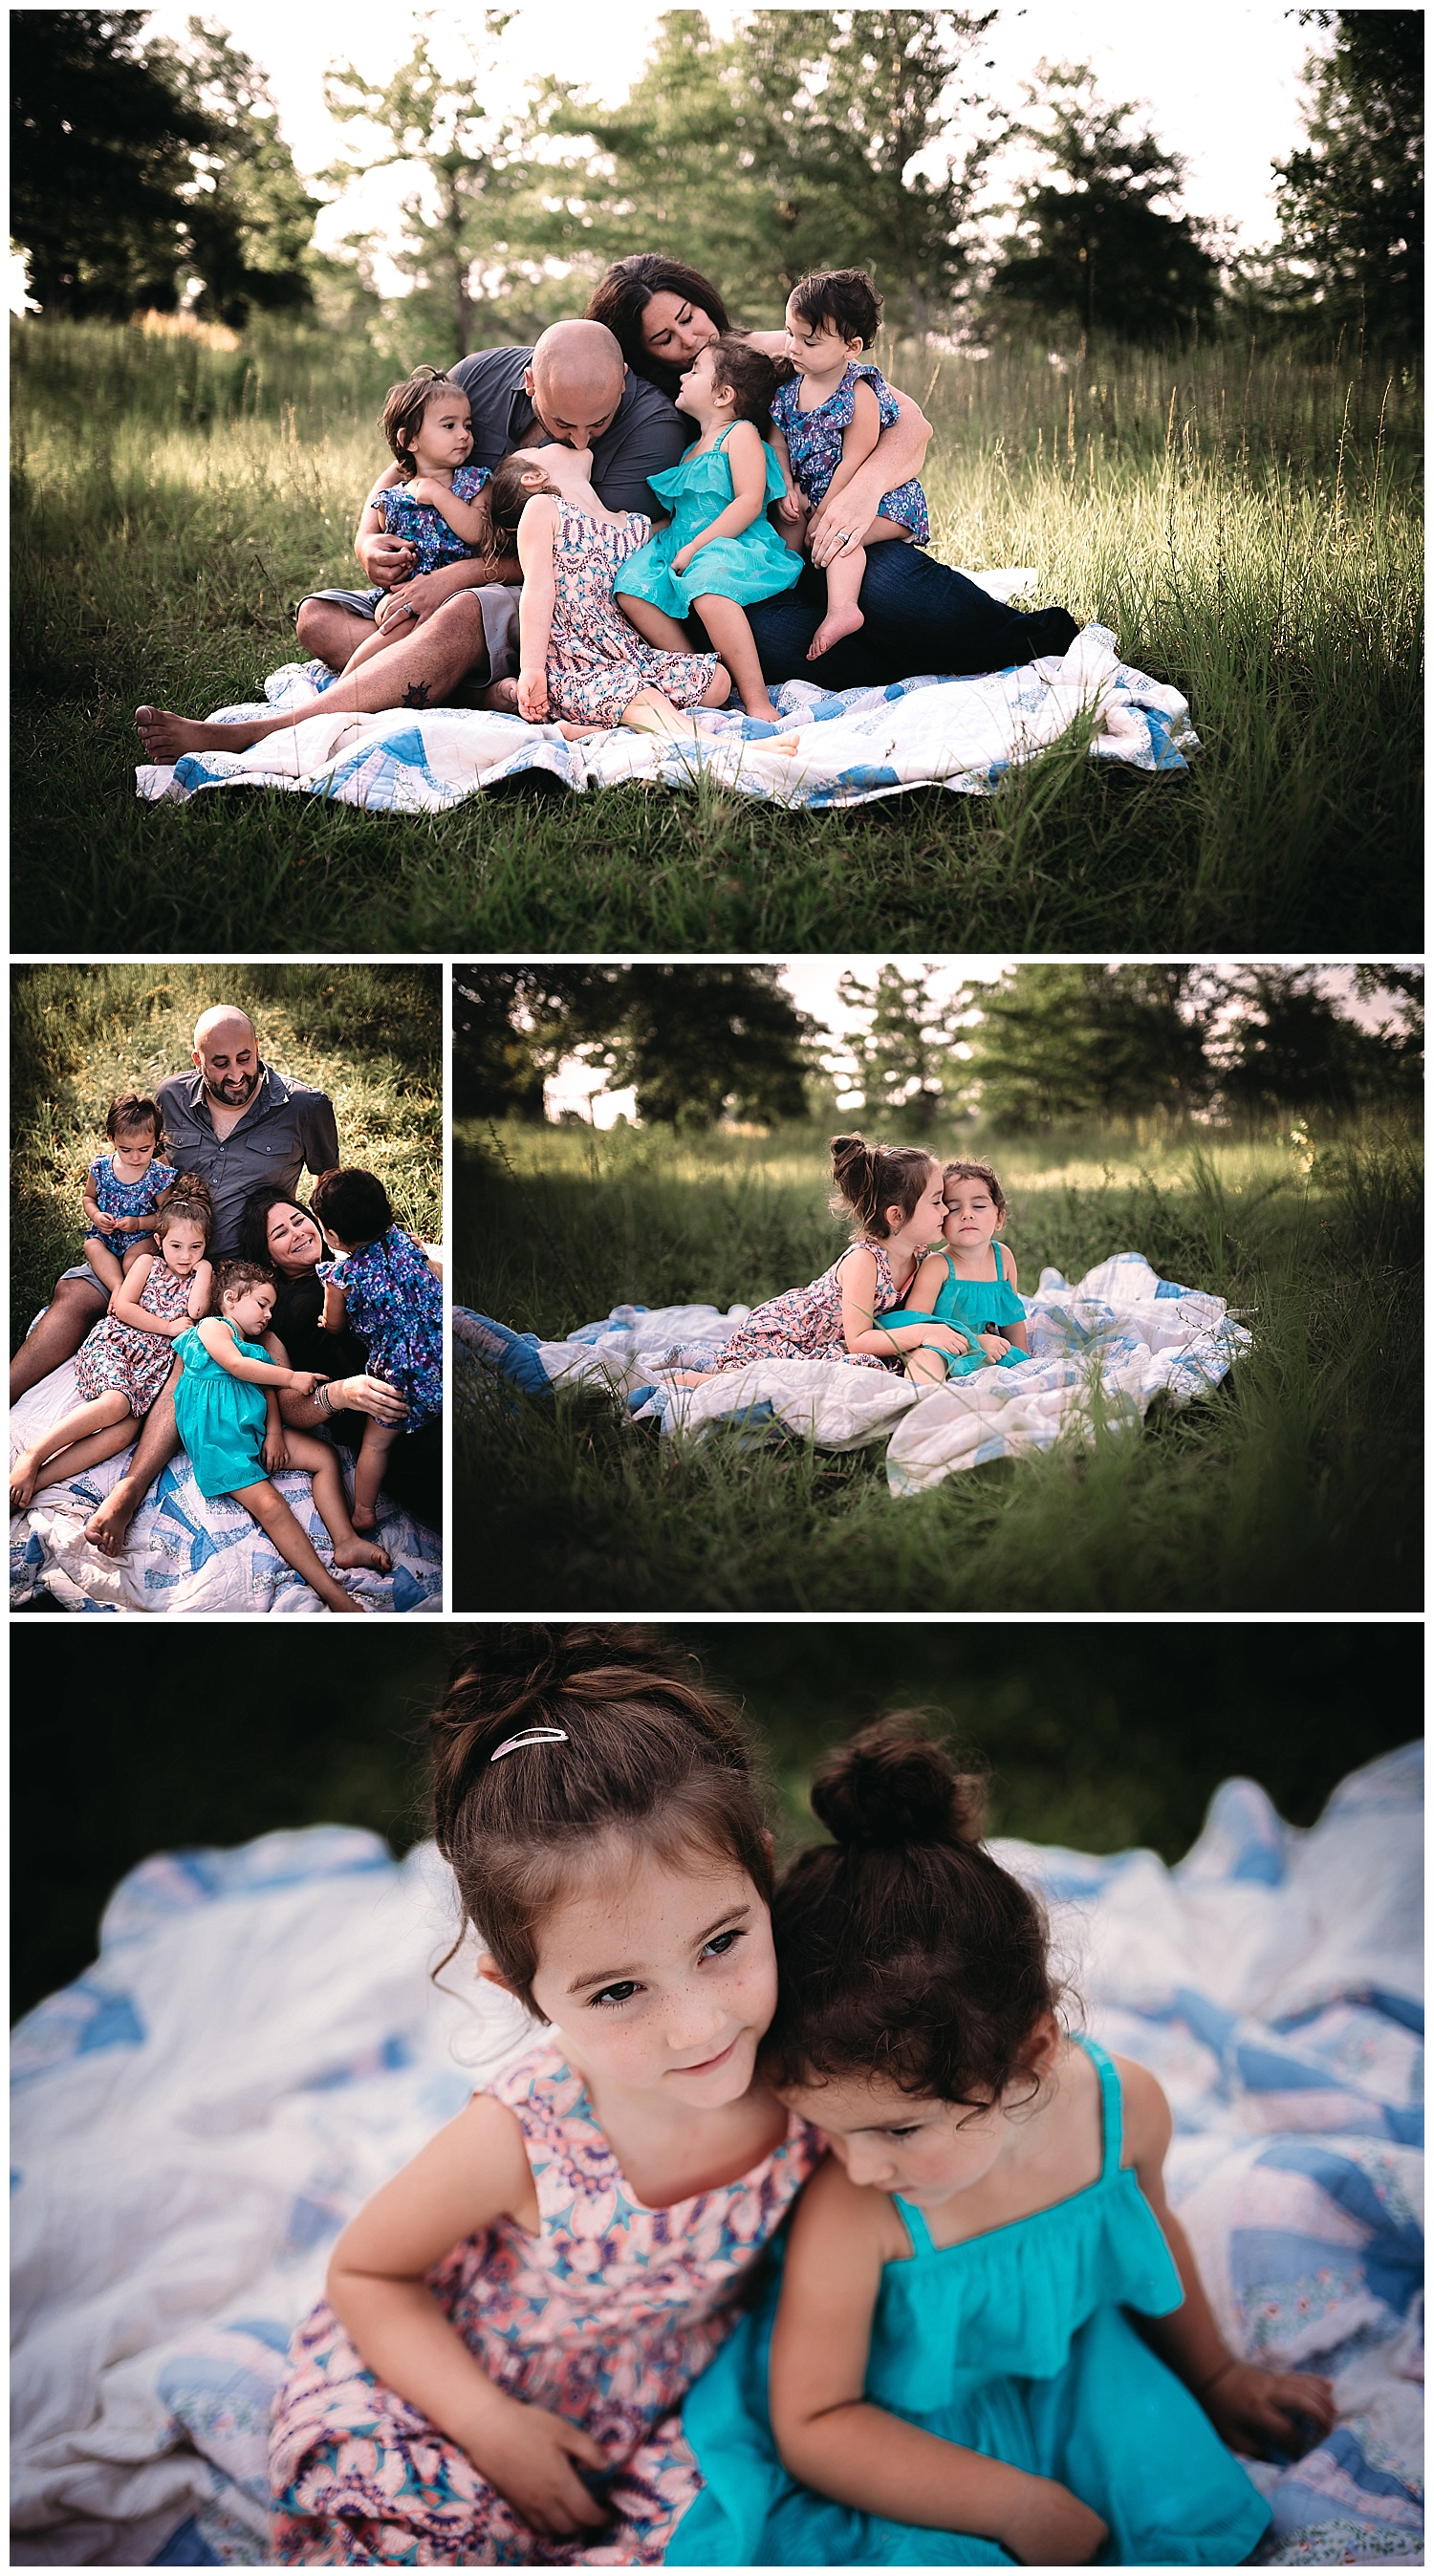 Destination Family Photographer in Atlanta GA from Bloomsburg NEPA